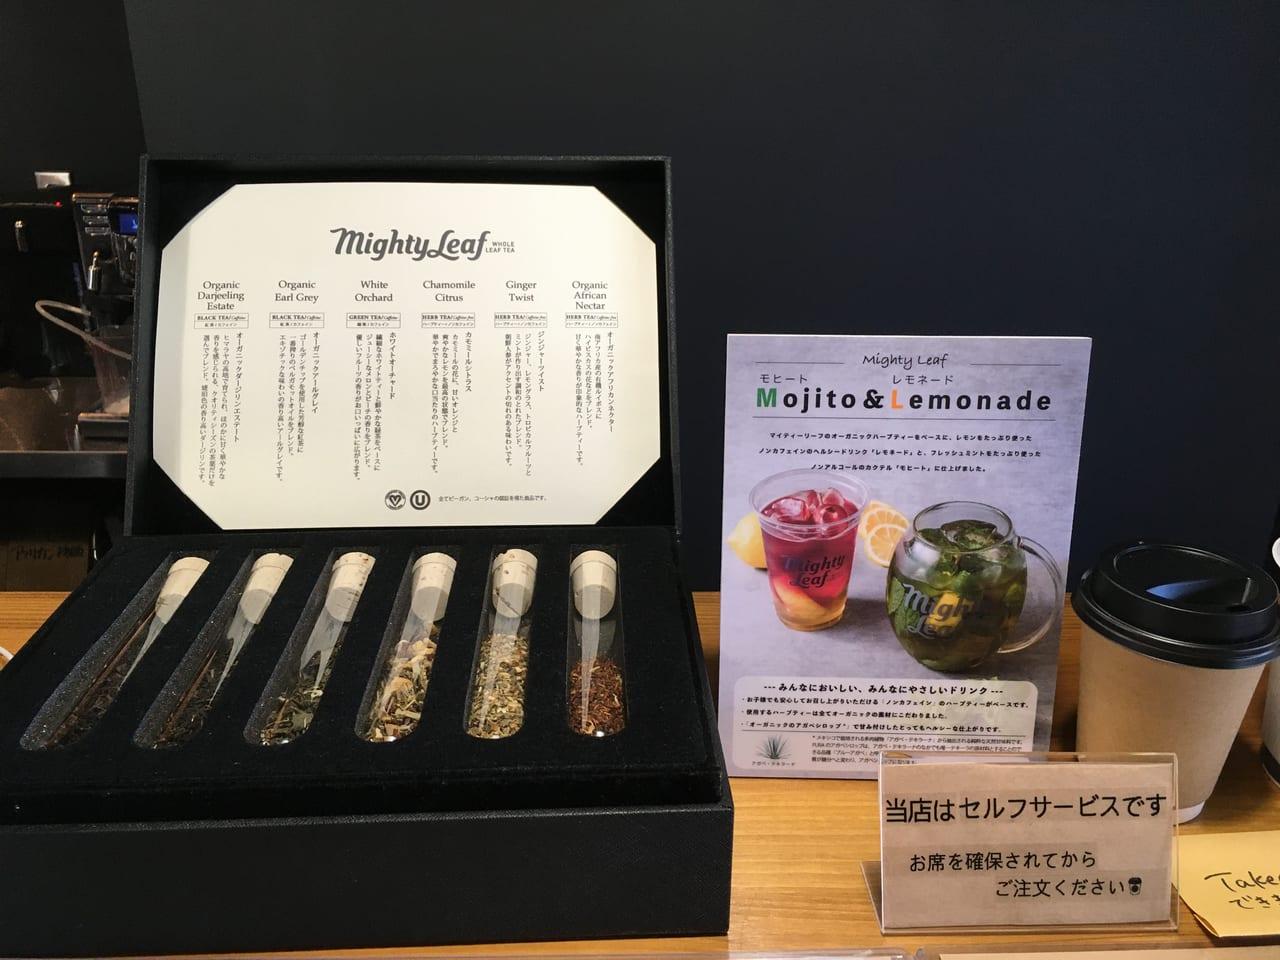 TEASTANDBunBunBunの茶葉はmightyleaf社の茶葉